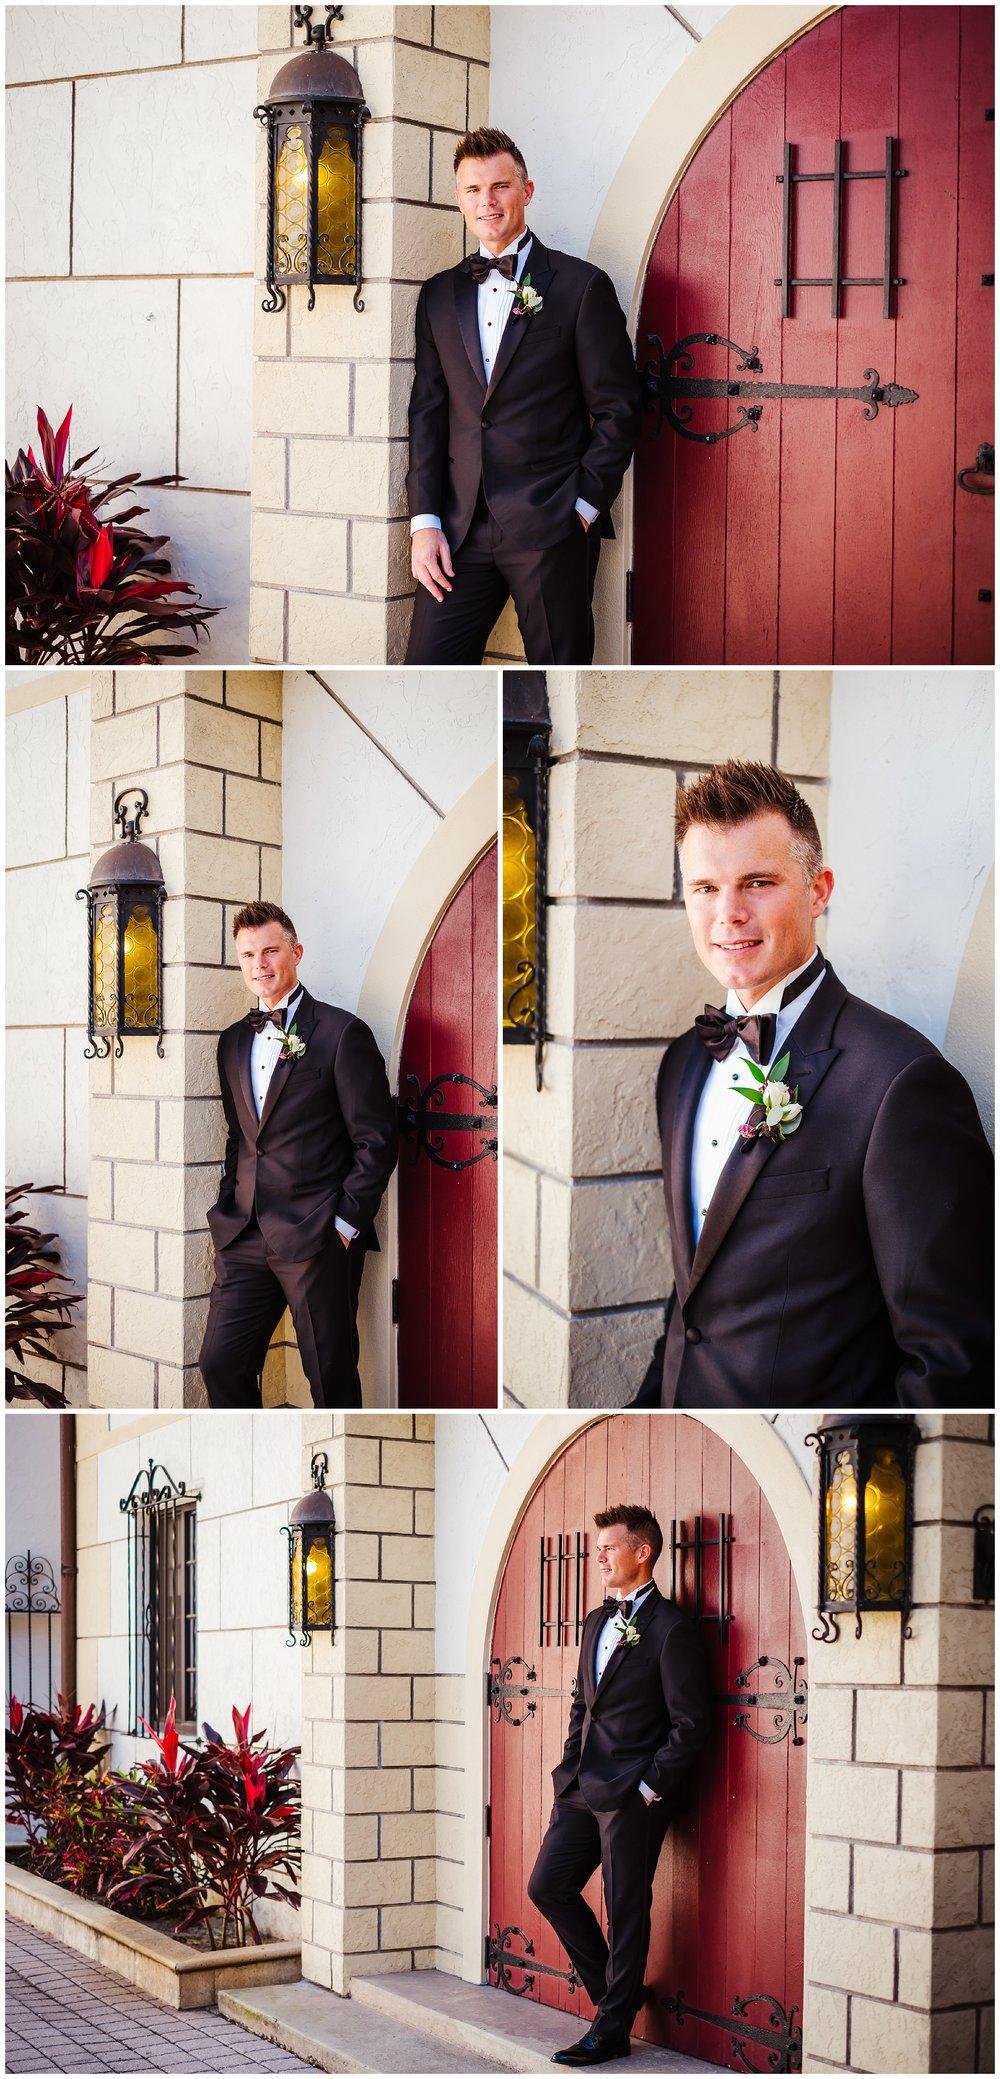 tampa-bradenton-wedding-photographer-south-florida-museum-classic-blush-gold-alpacas-sparklers_0035.jpg